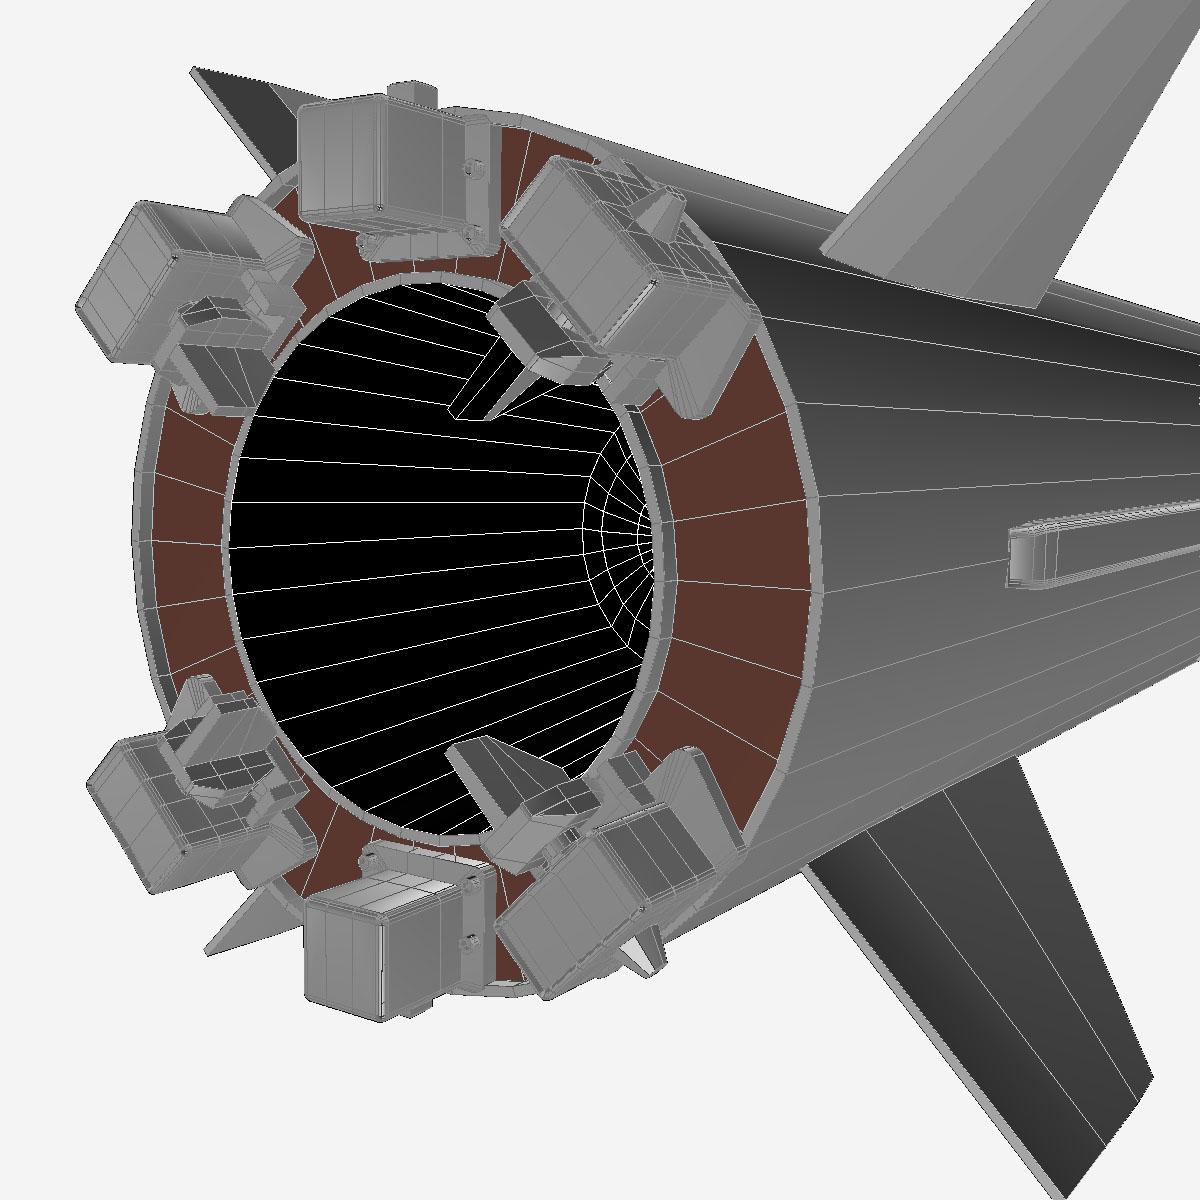 БНХАУ-ын С-400 пуужин 3d загвар 3ds dxf cob x obj 157972